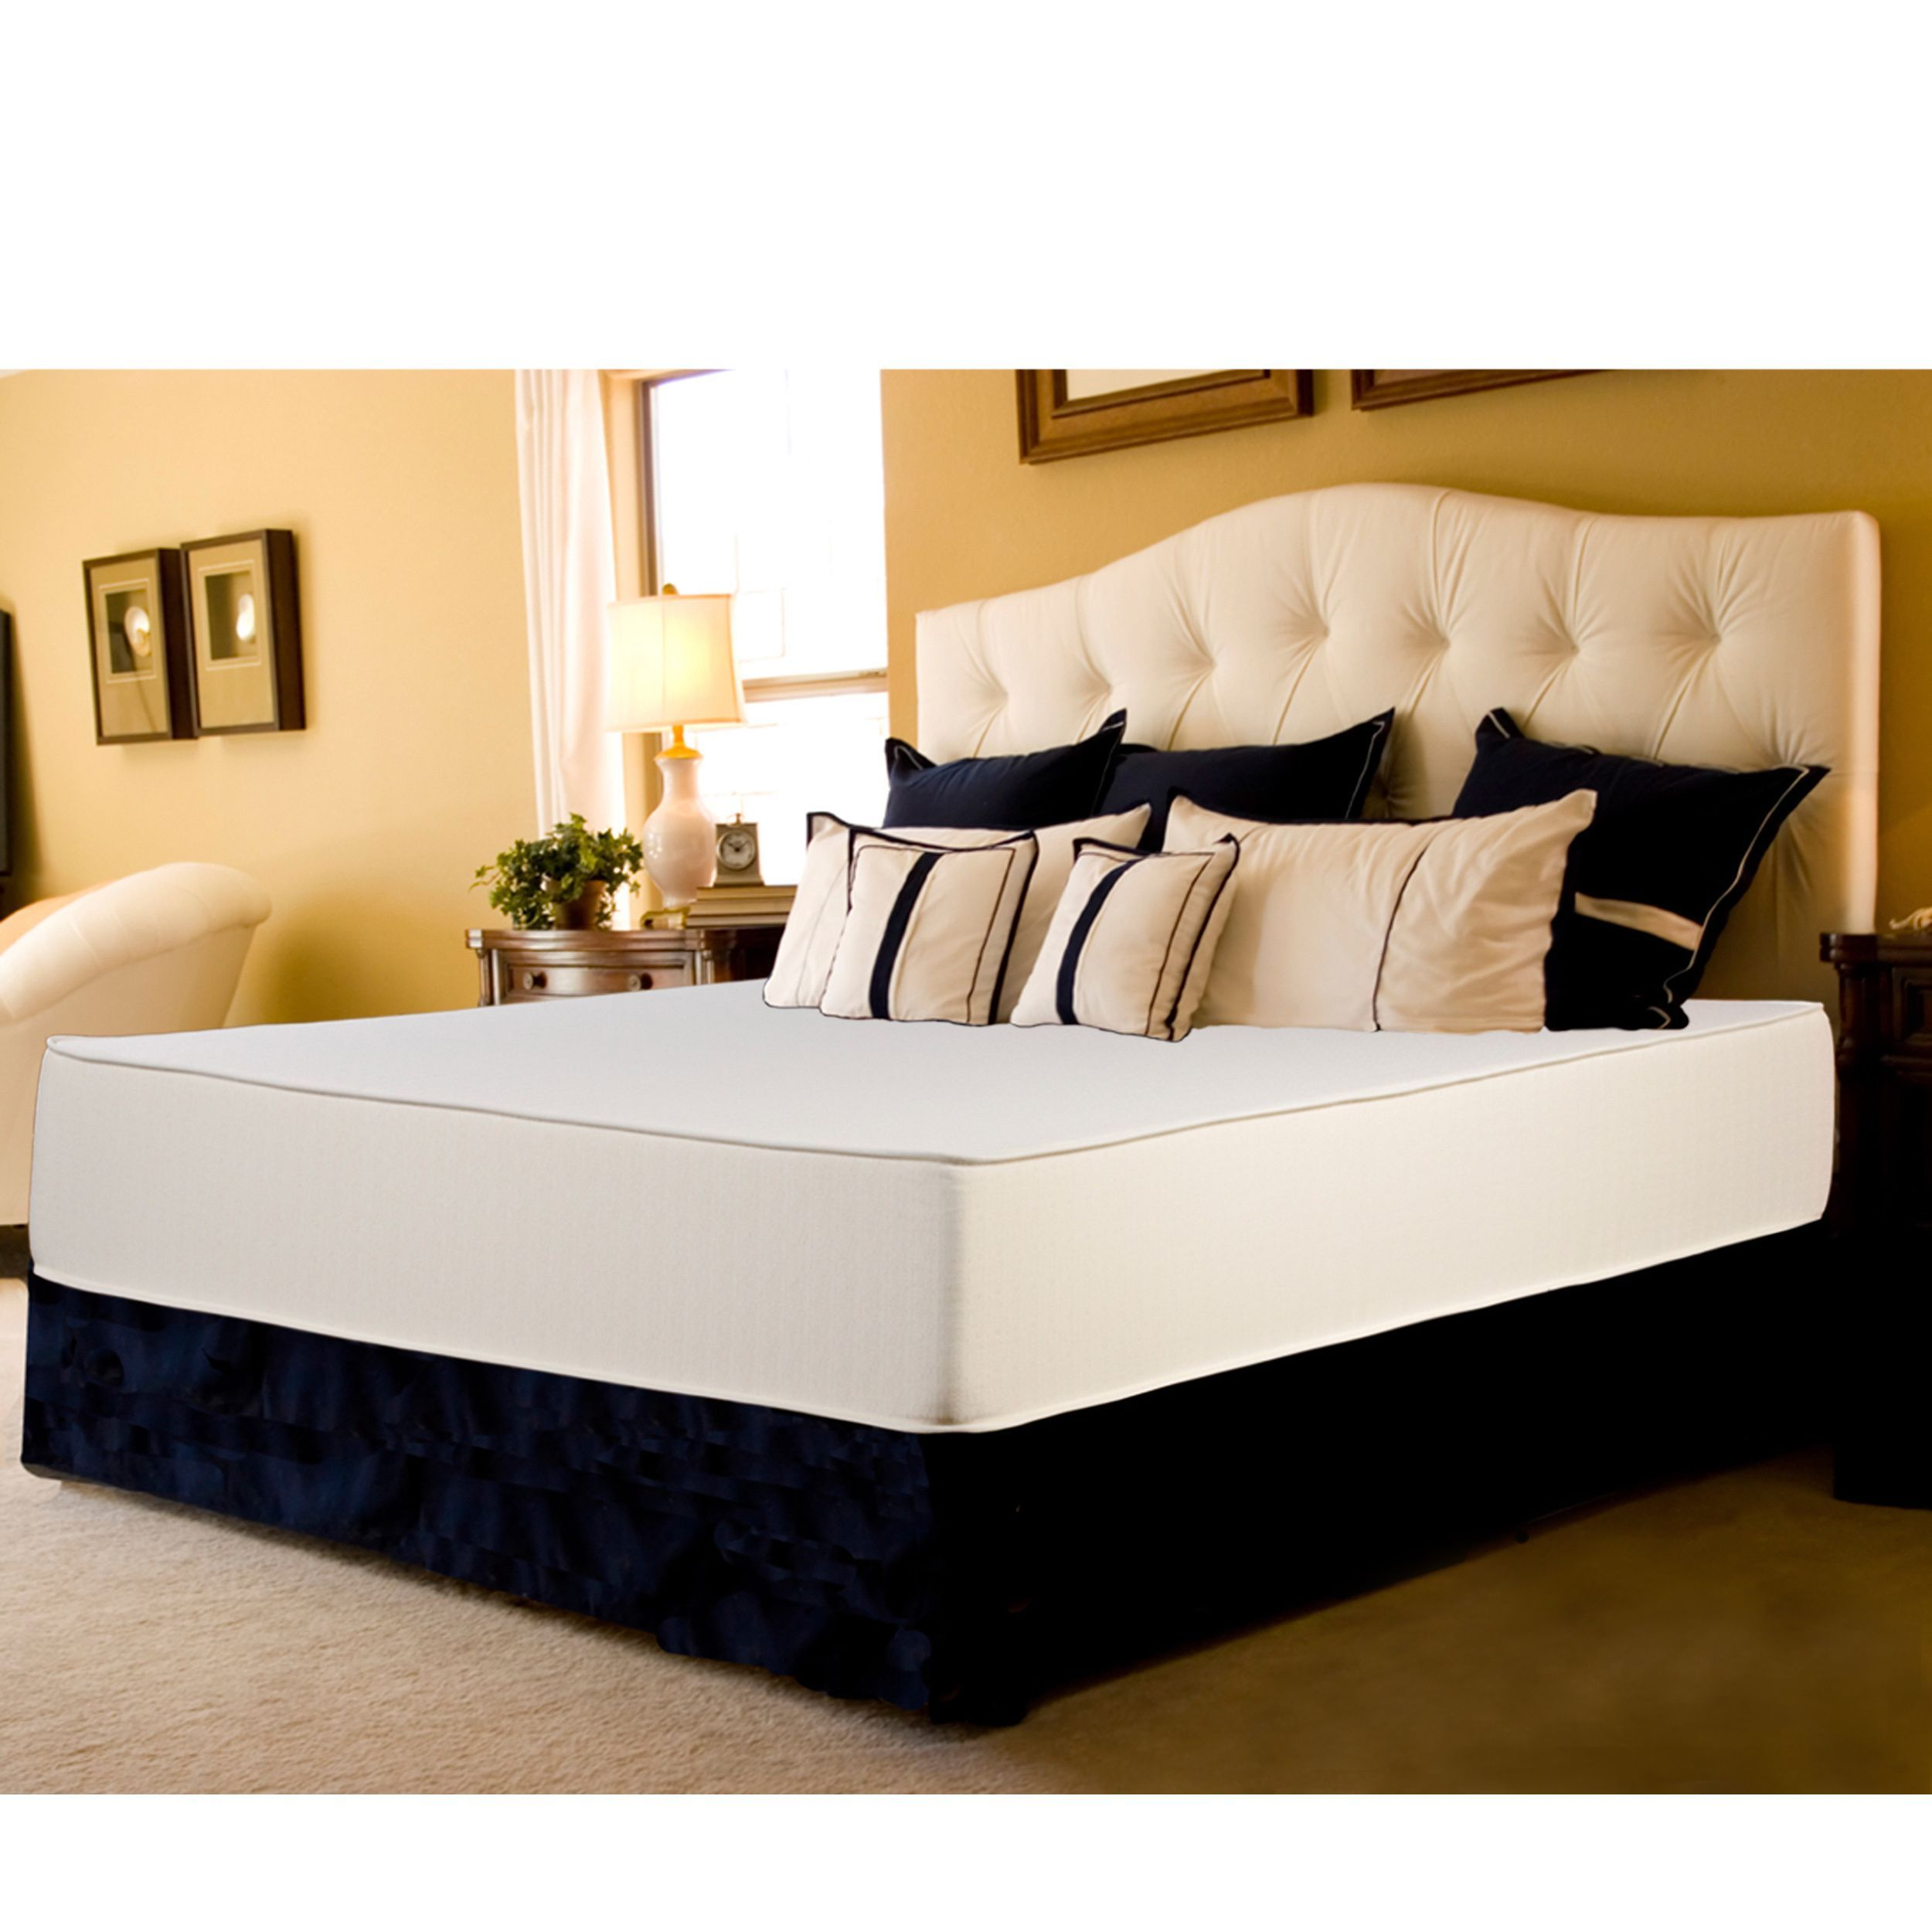 Select Luxury Flippable 12inch Queensize Foam Mattress